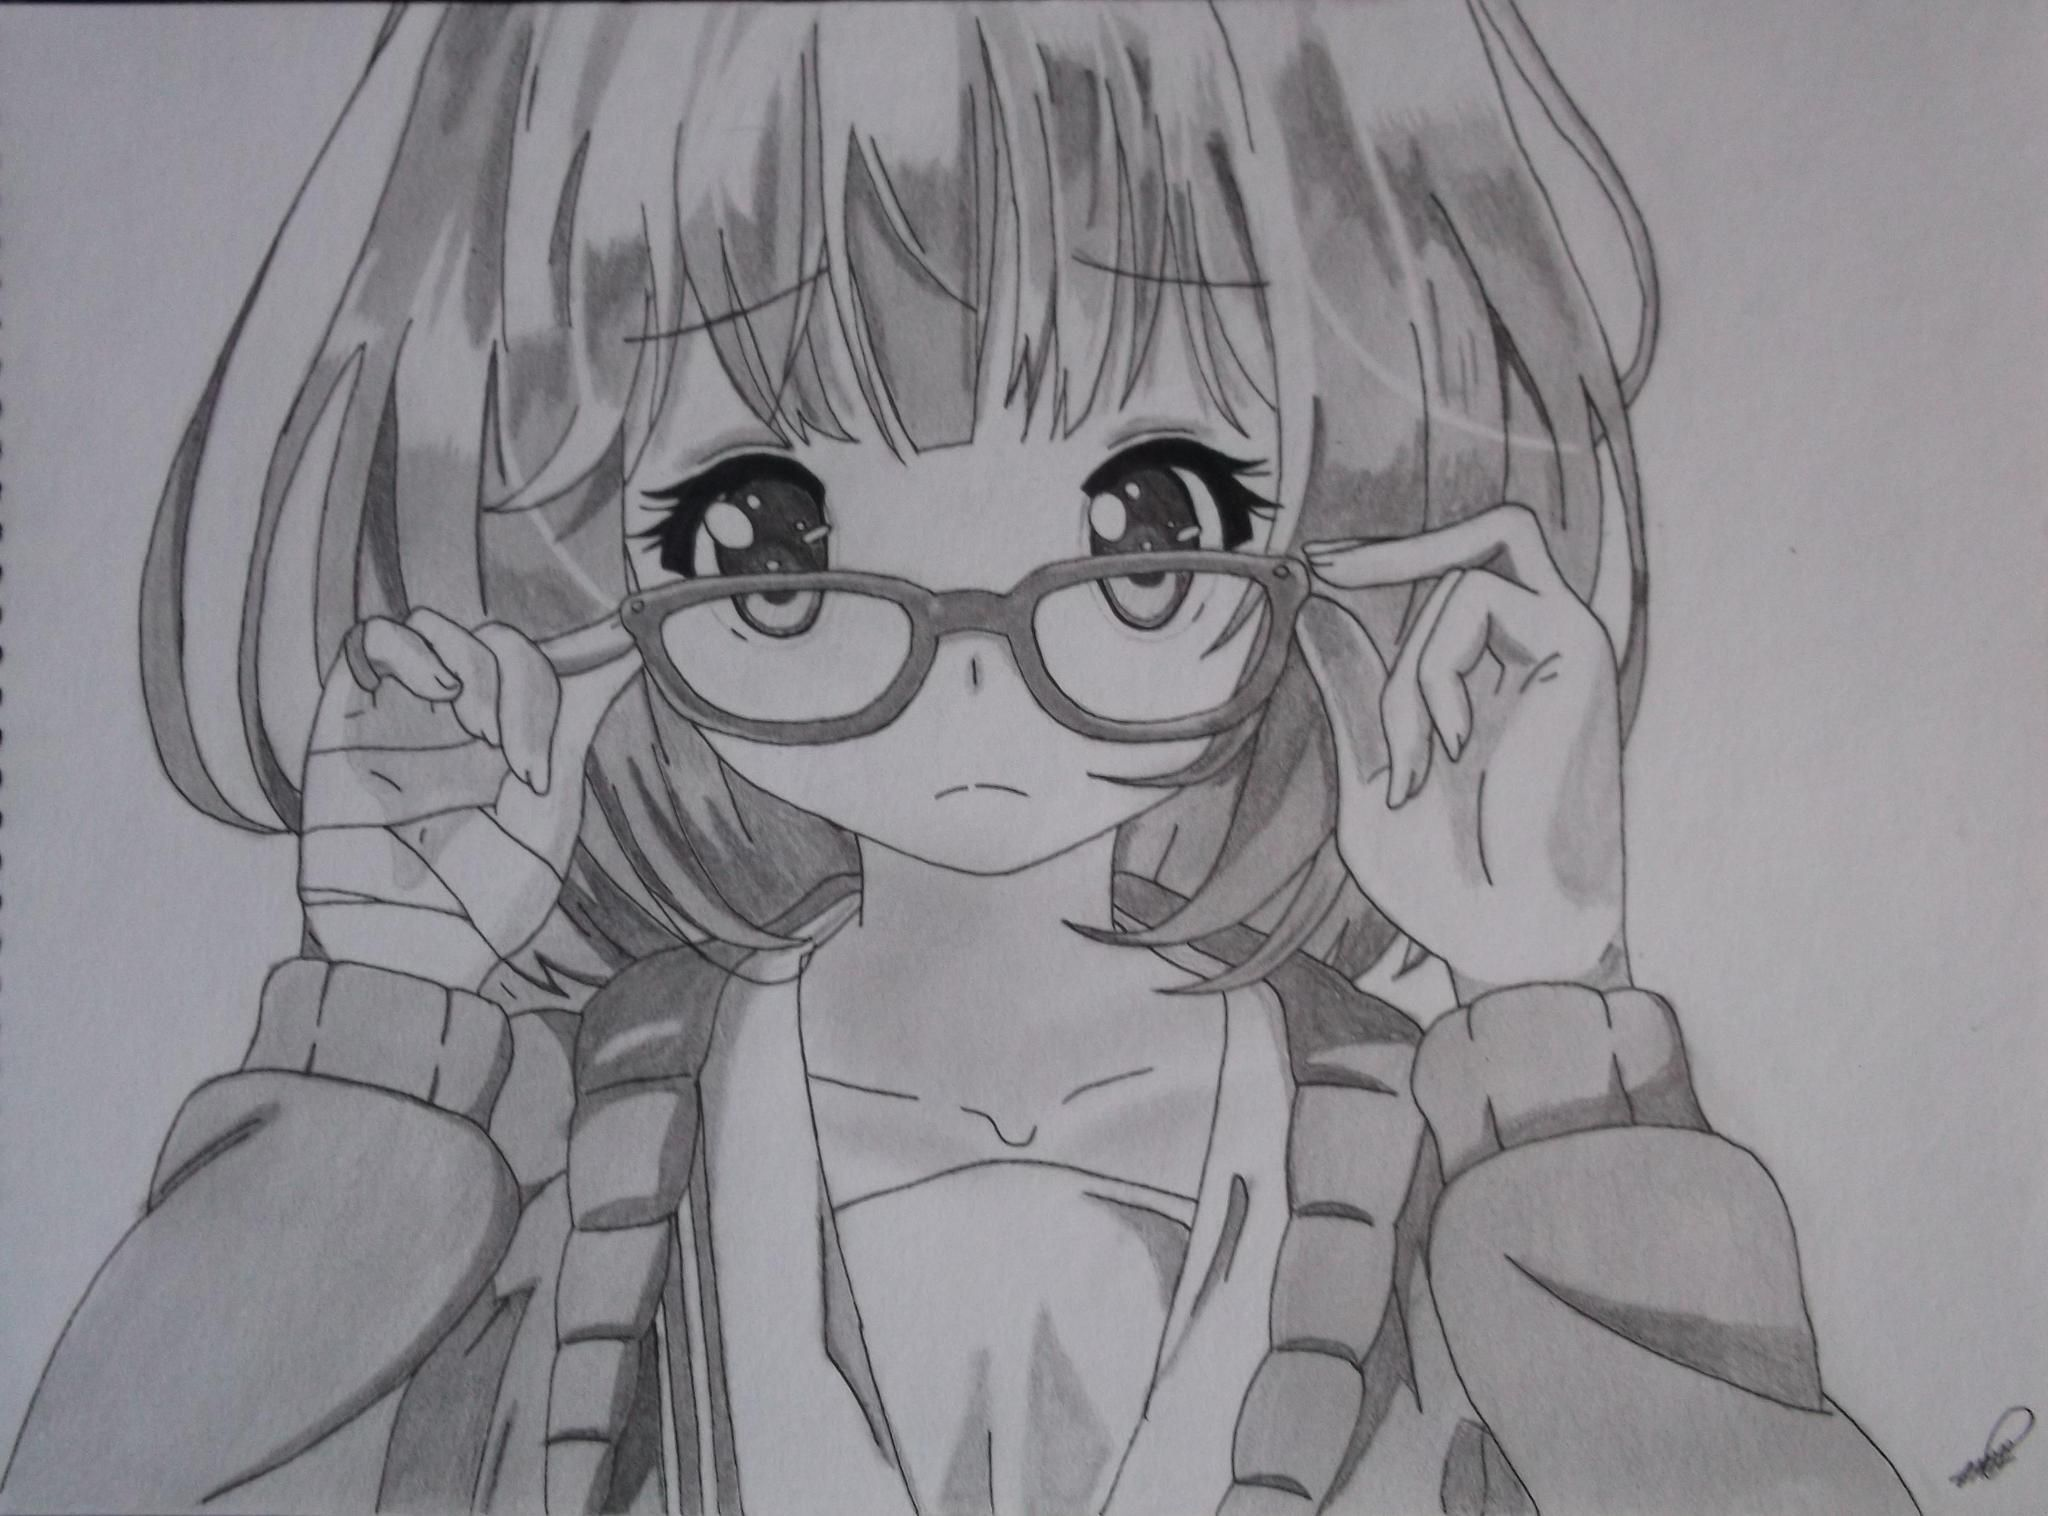 Dibujo Anime Dibujos, Dibujos de anime, Dibujos realistas